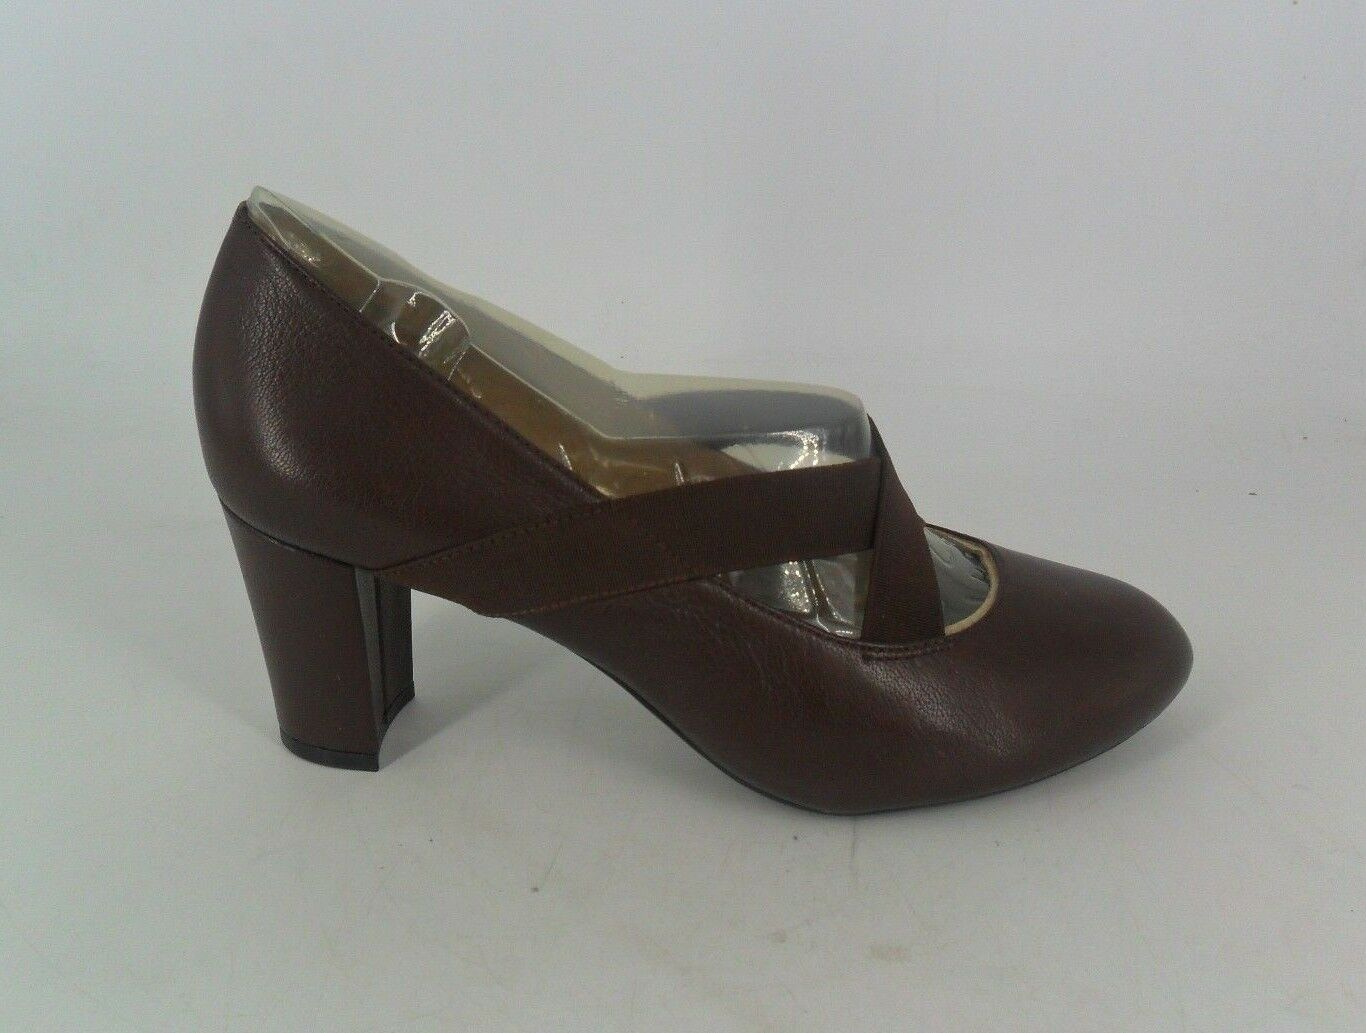 Naturalizer Brown Shoes Elastic Cross Strap Court Shoes Brown UK 5 EU 37 JS088 EE 01 fea430